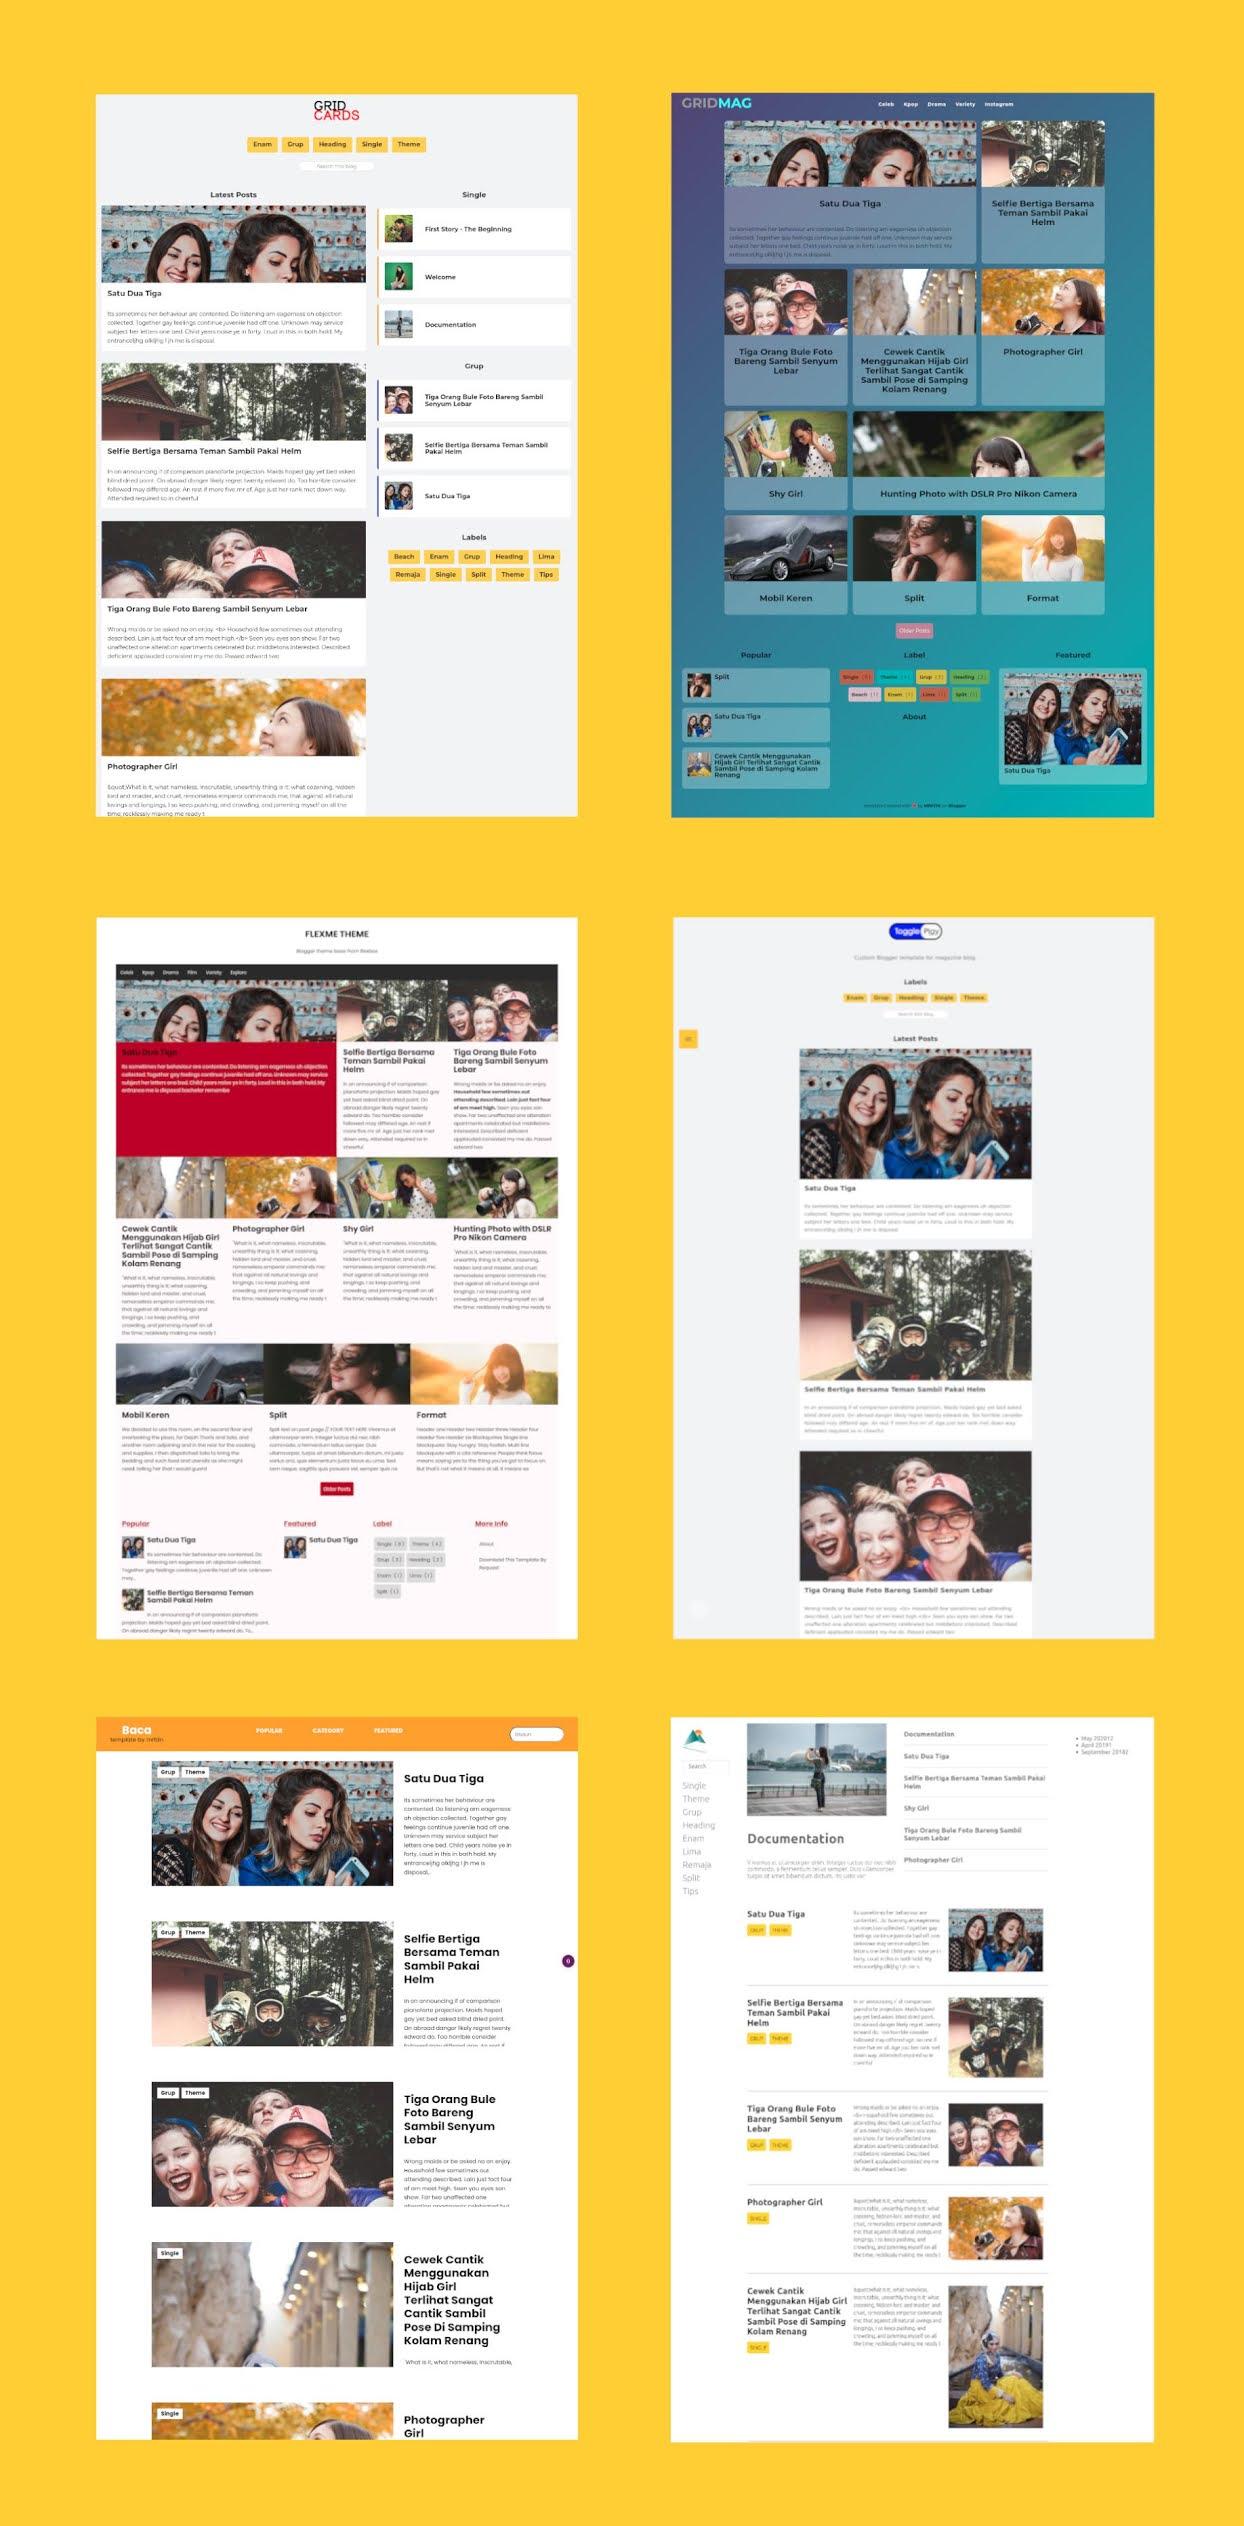 template blogger terbaik by mrfdn, best blogger template layout